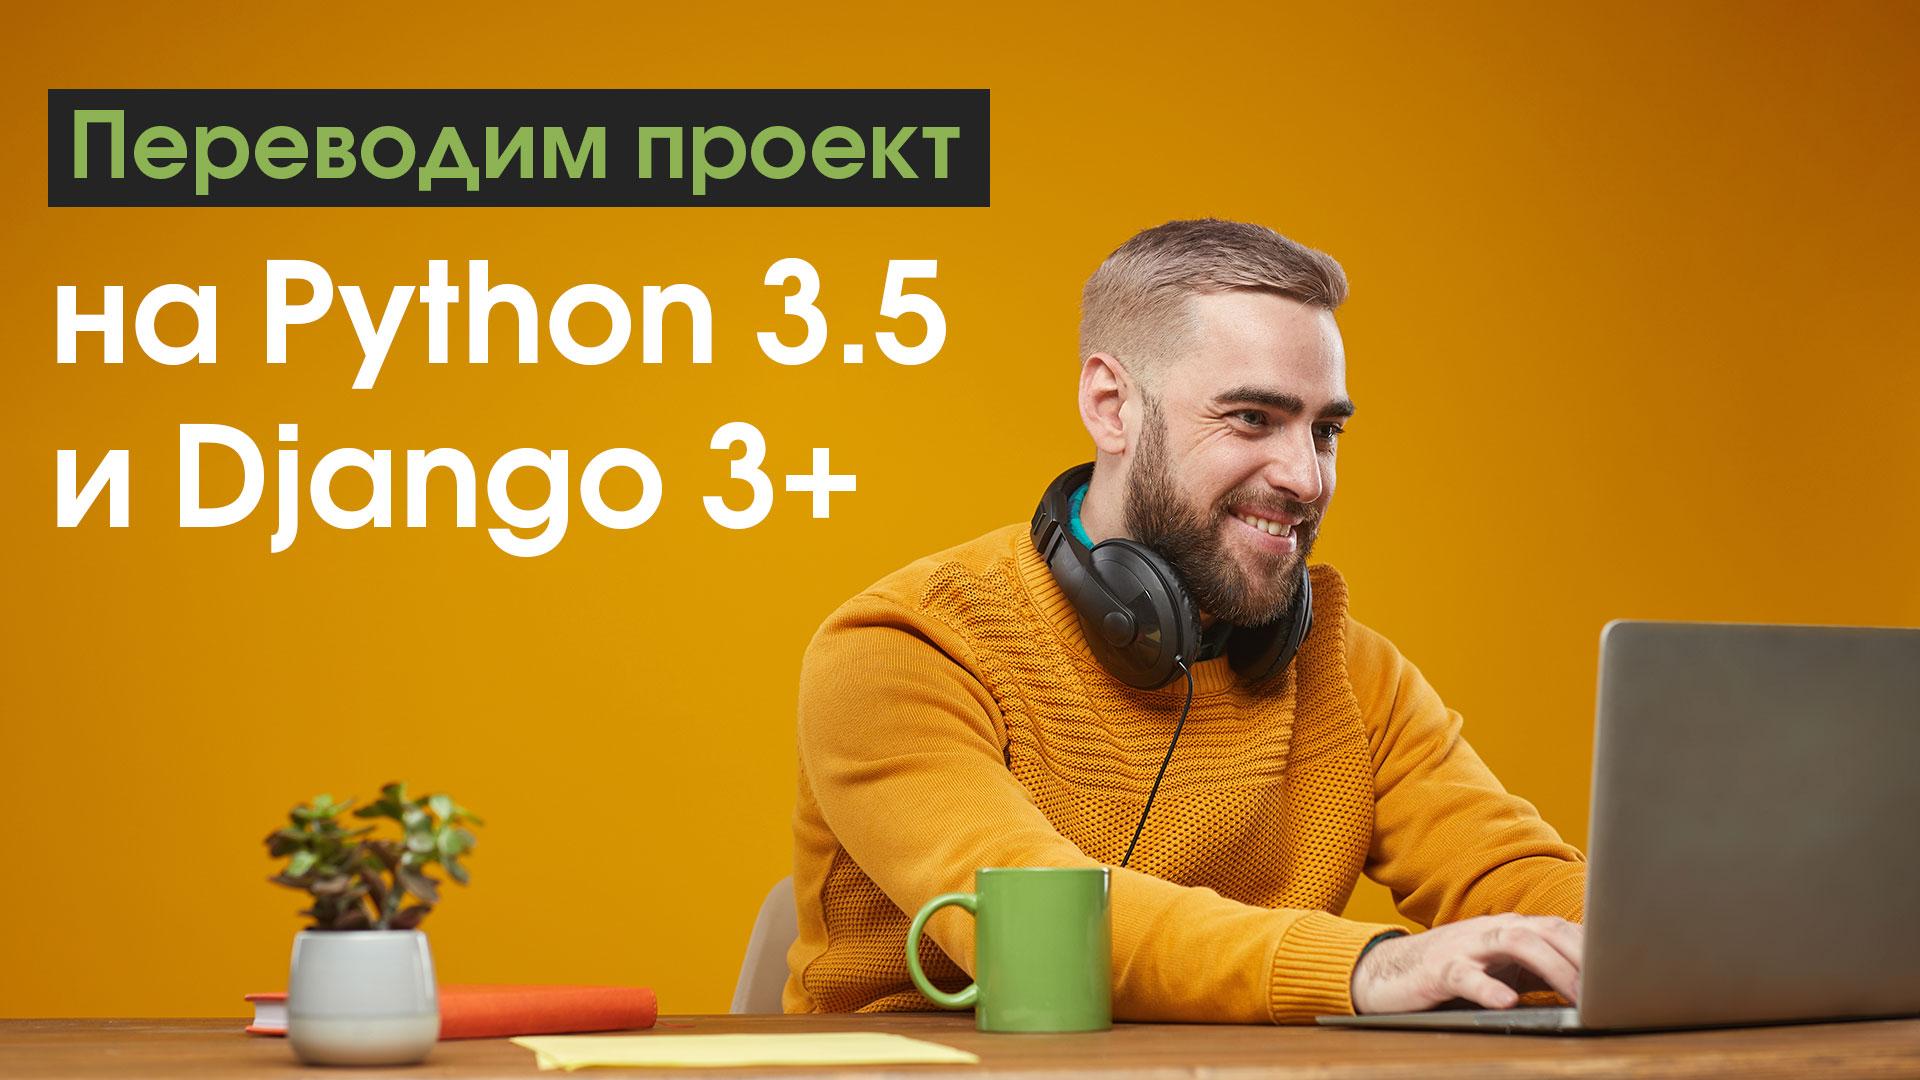 Переводим проект на Python 3.5 и Django 3+